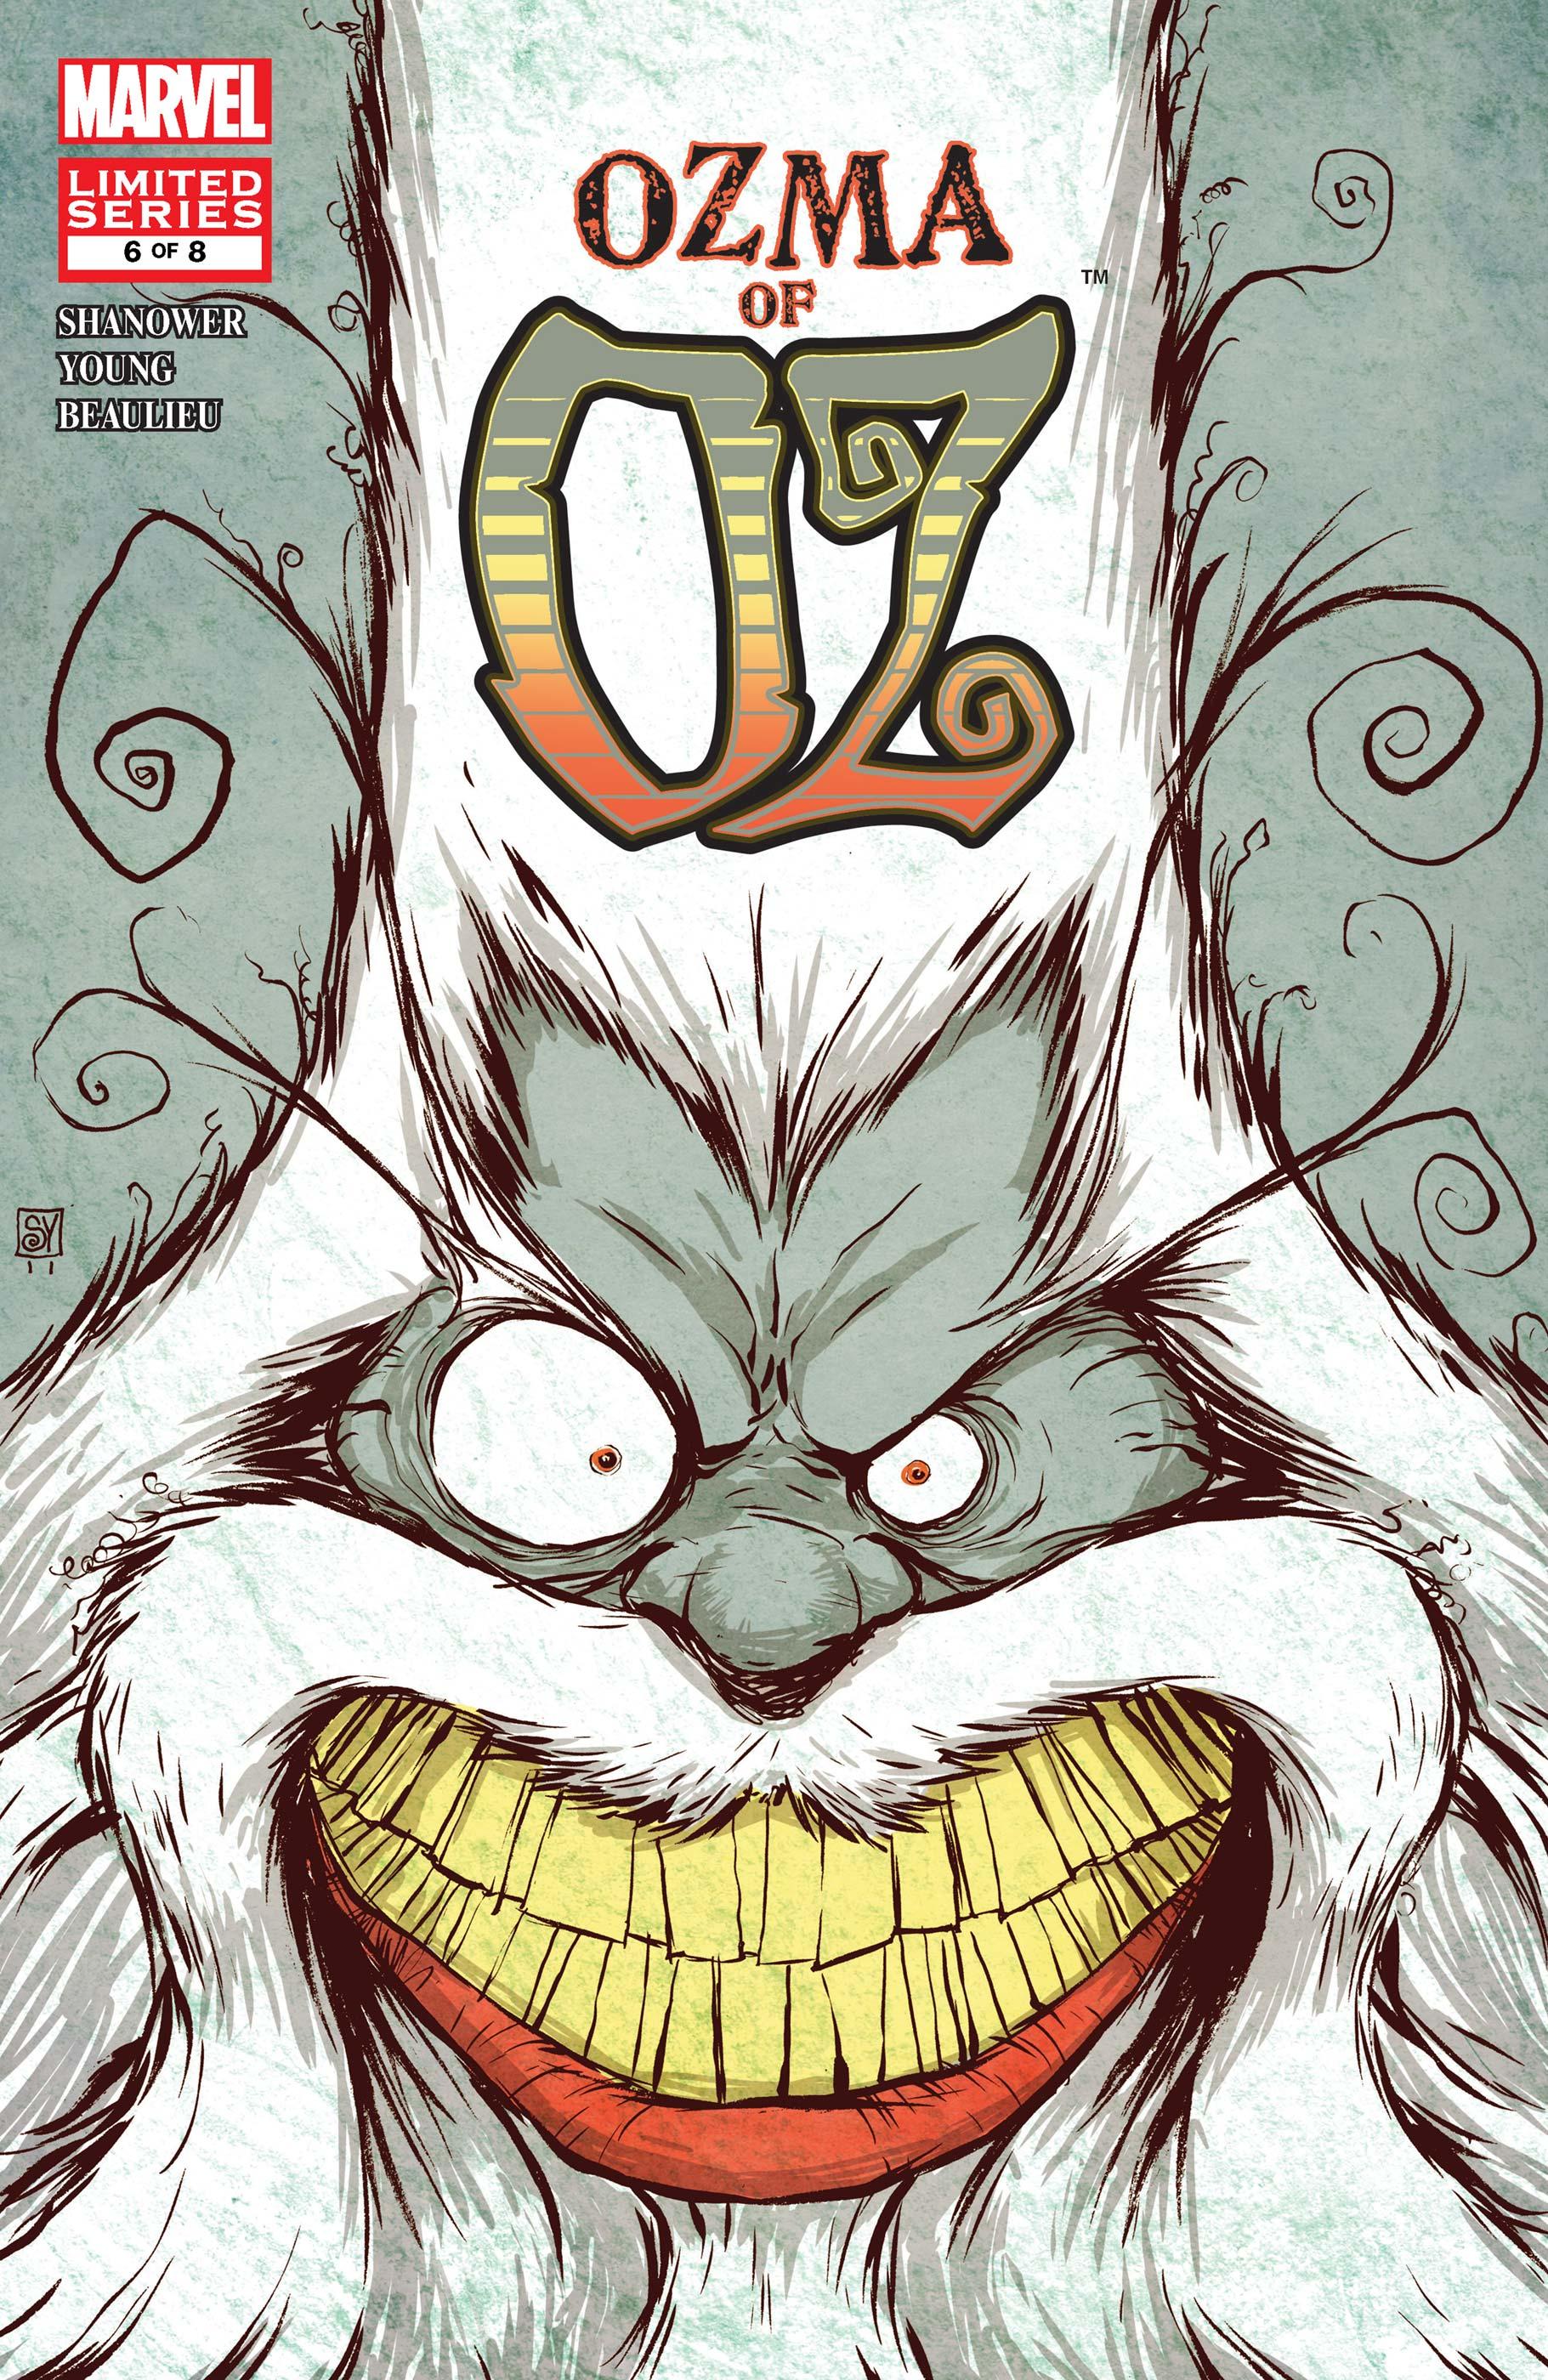 Ozma of Oz (2010) #6